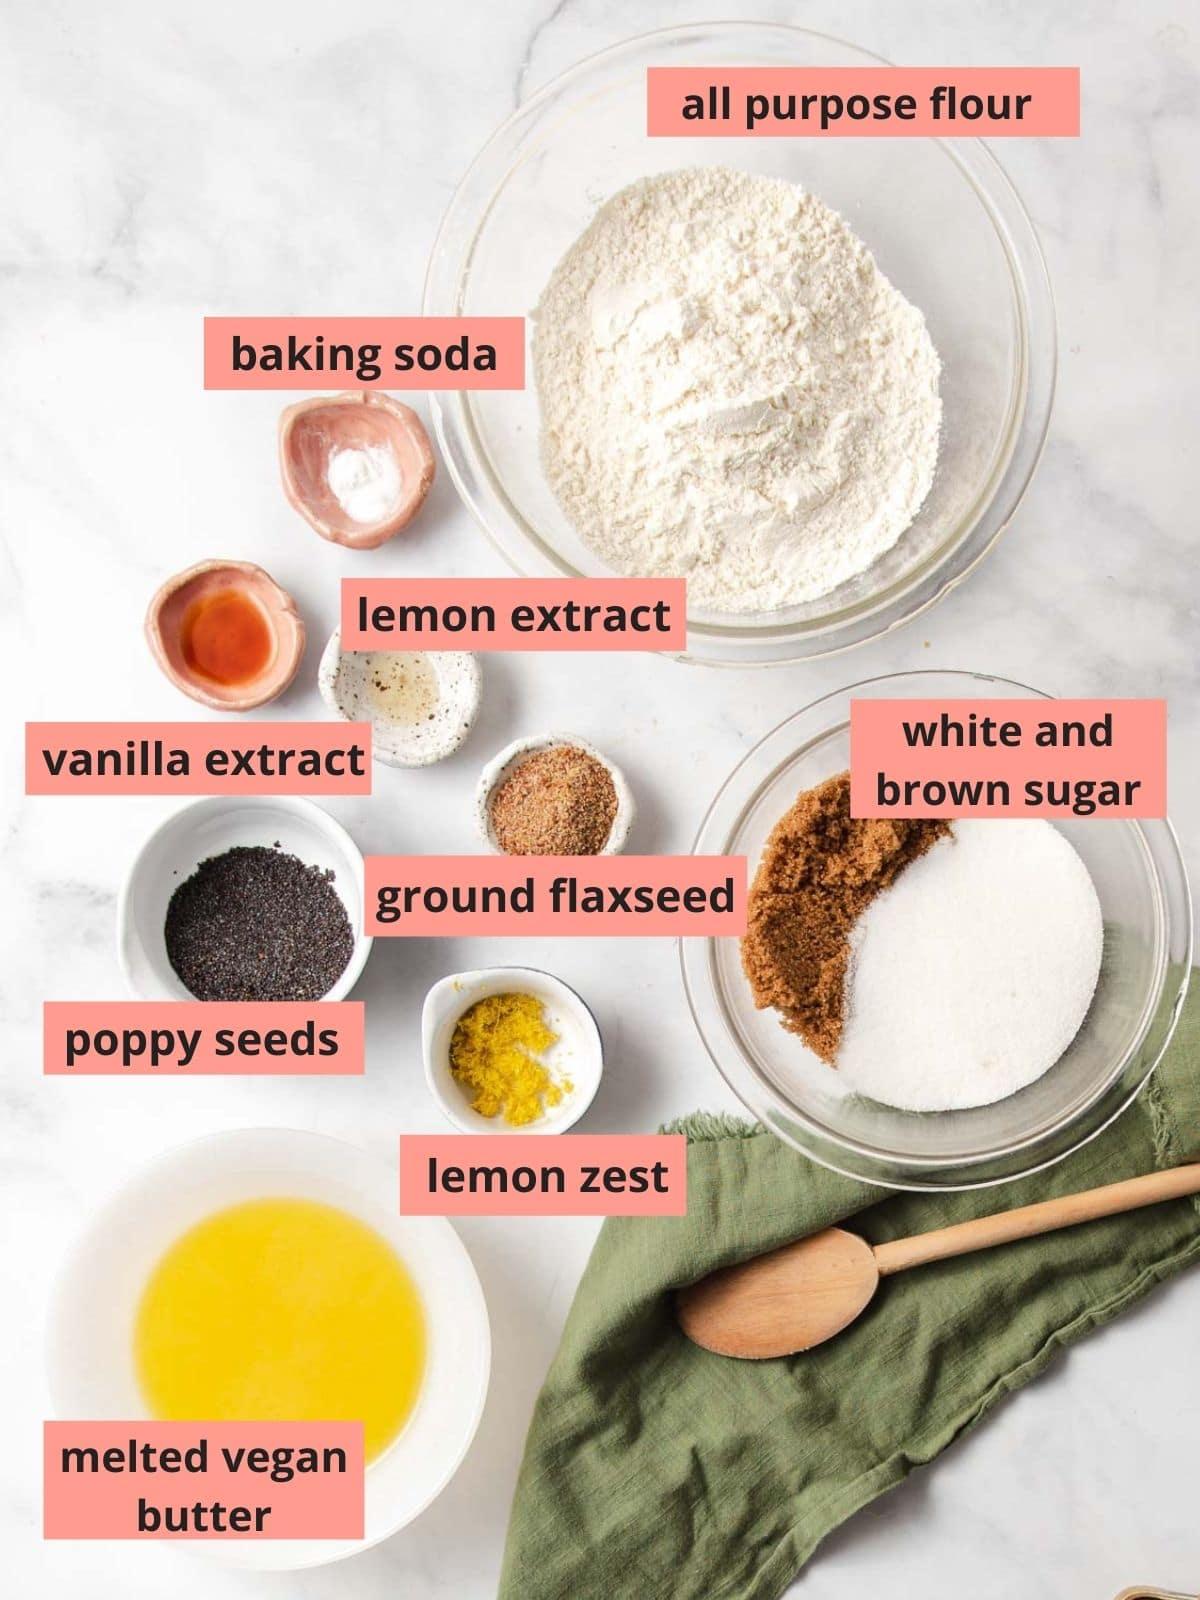 Labled ingredients used to make lemon poppy seed cookies